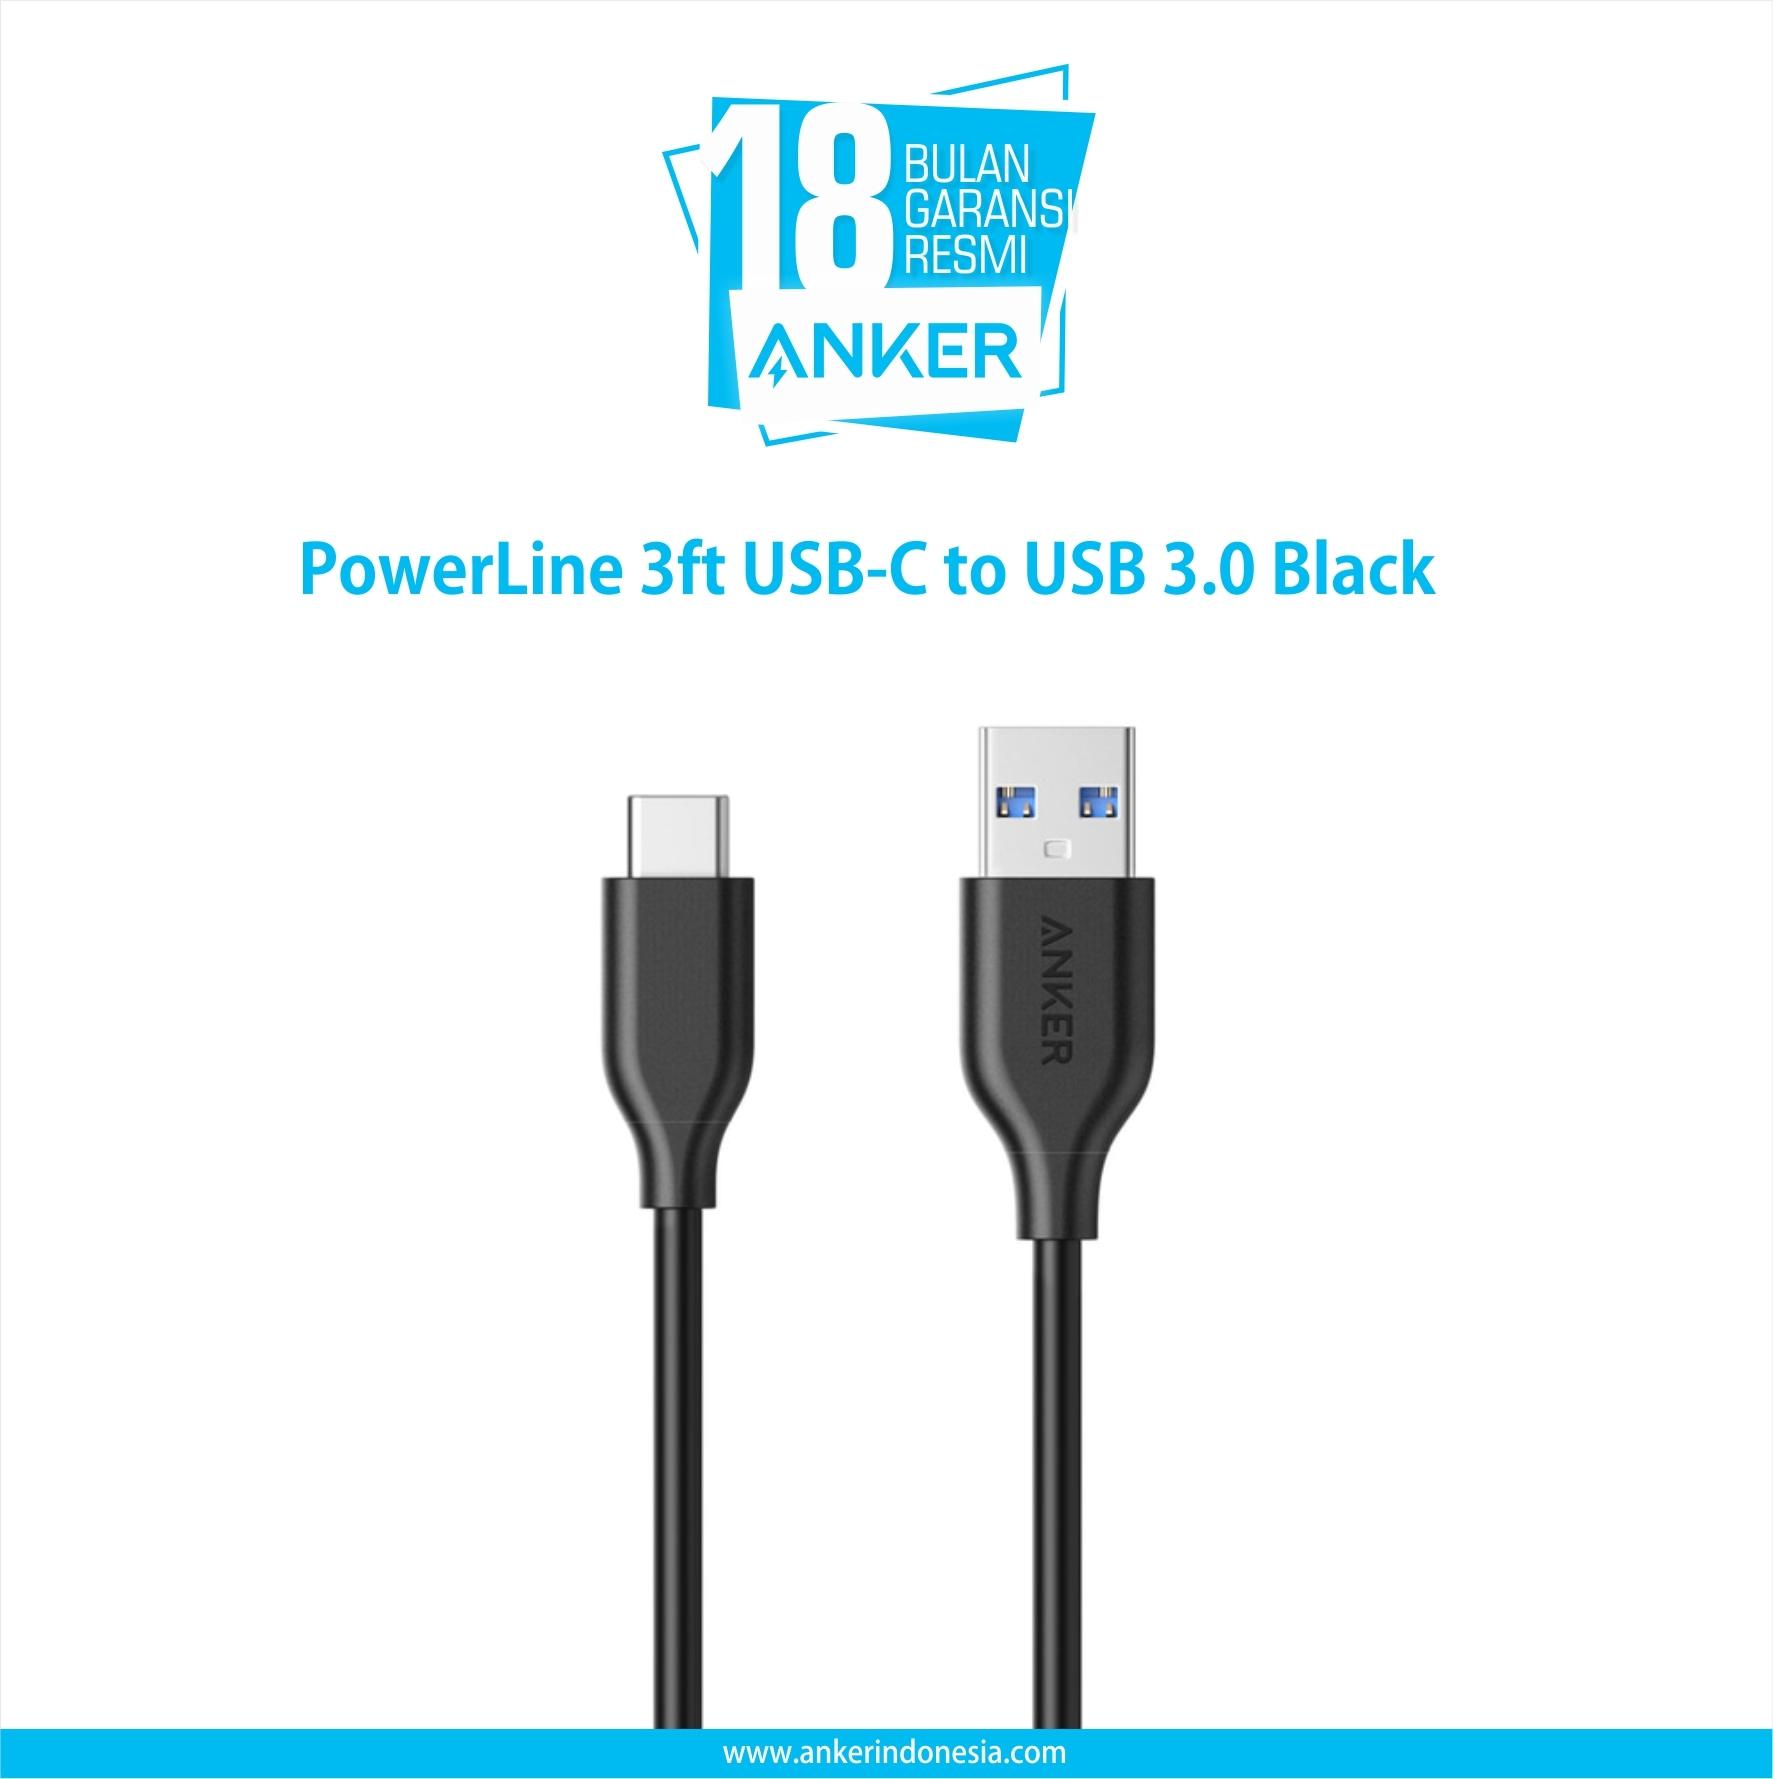 Anker Powerline 3ft Usb-C To Usb 3.0 Black A8163h11 - Blanja.com